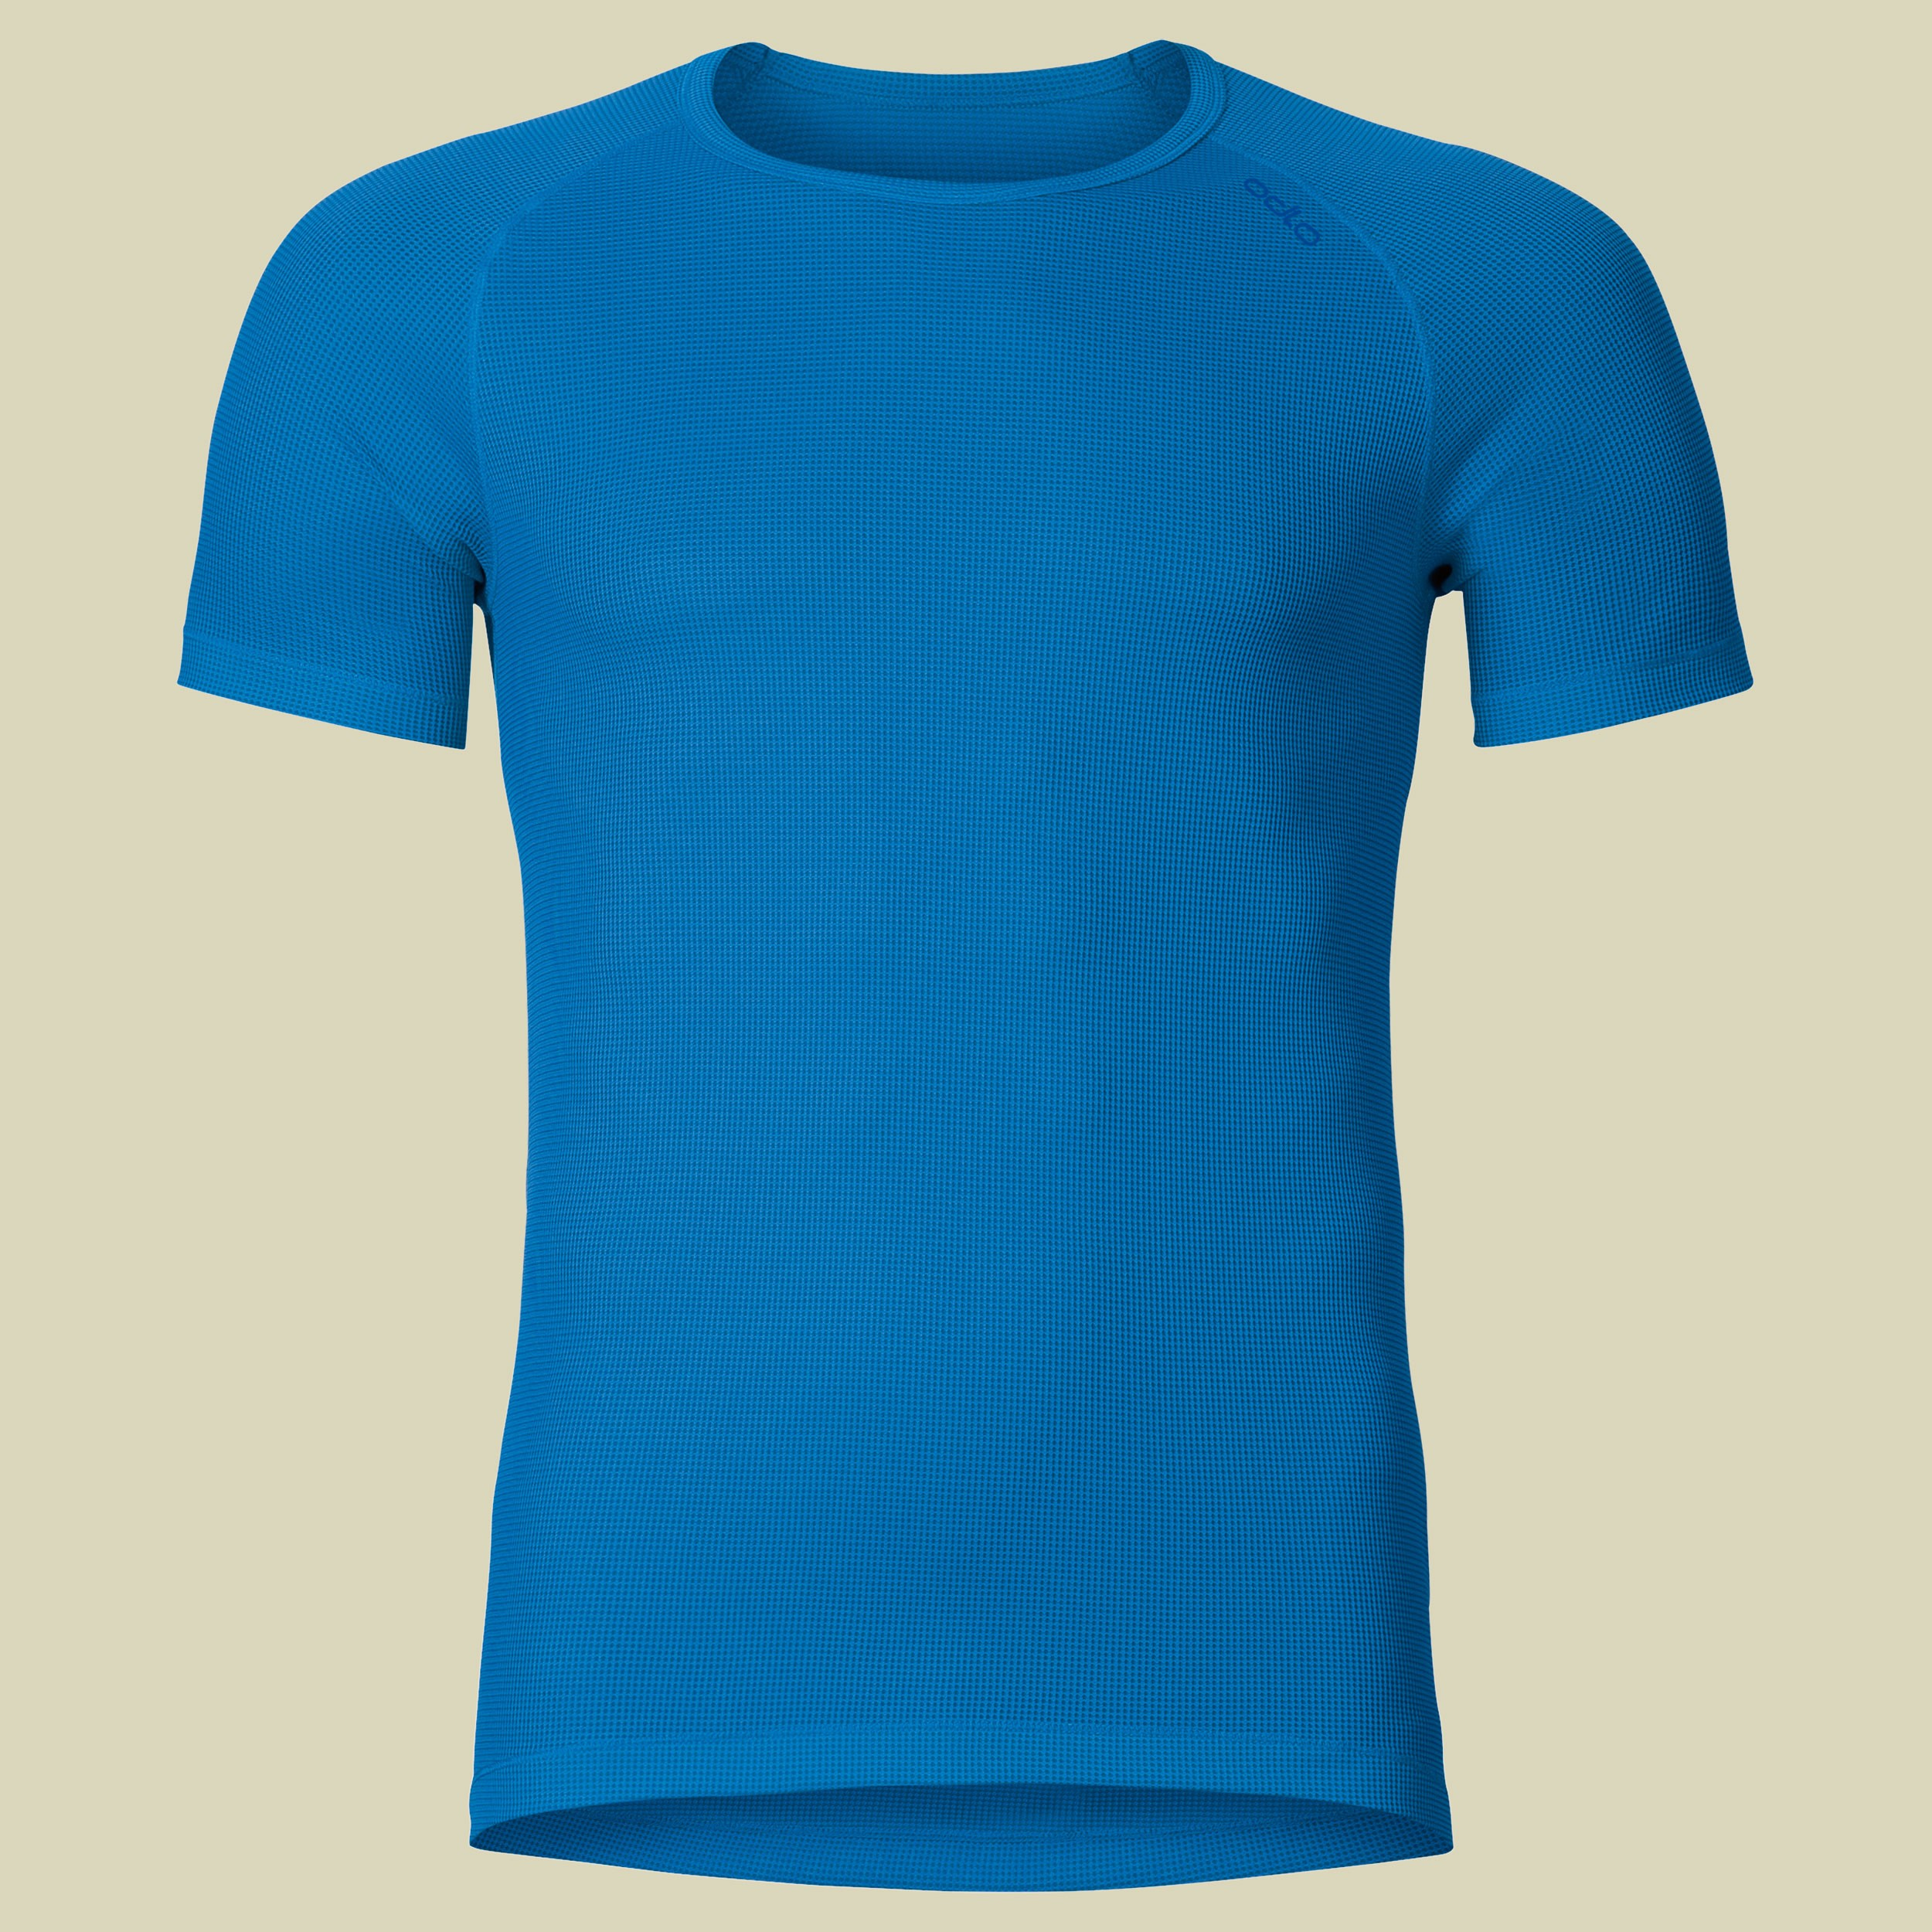 odlo_funktionsunterhemd_cubic_shirt_s-s_crew_neck_uw_m_t_0000_140042_10000_fallback.jpg